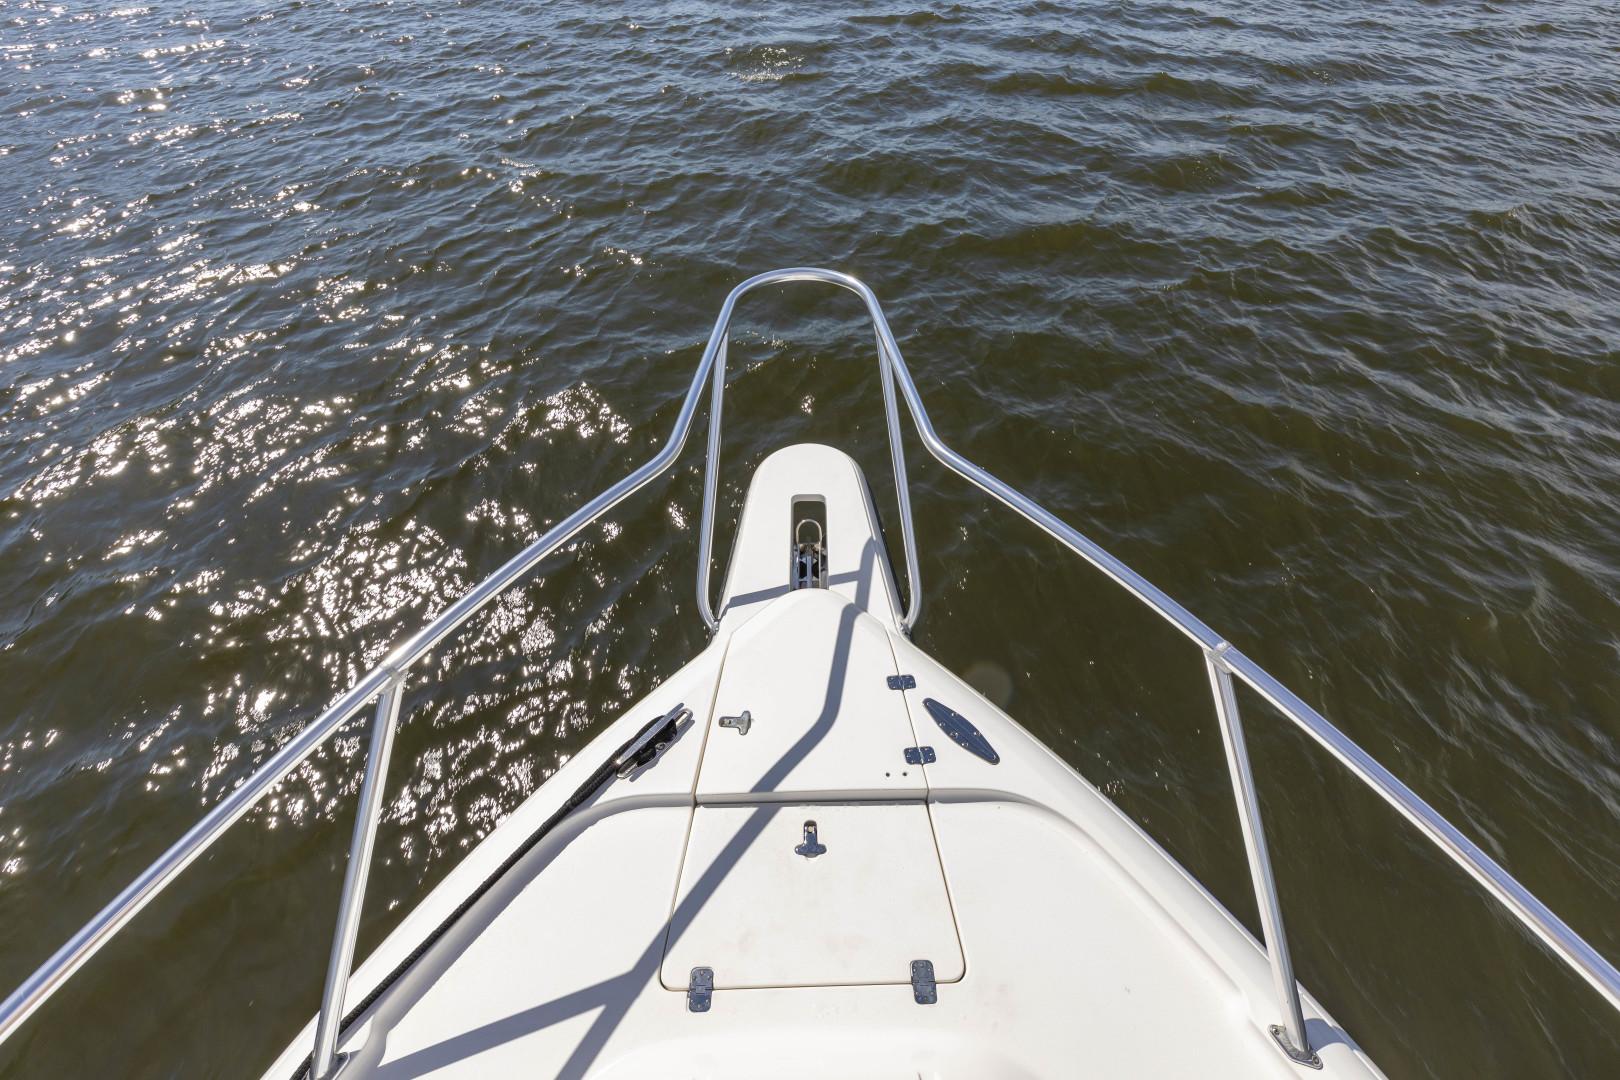 Intrepid-377 Walkaround 2005-Rock Boat REFIT 2018 Dania Beach-Florida-United States-377 Intrepid Bow 3-1511537 | Thumbnail